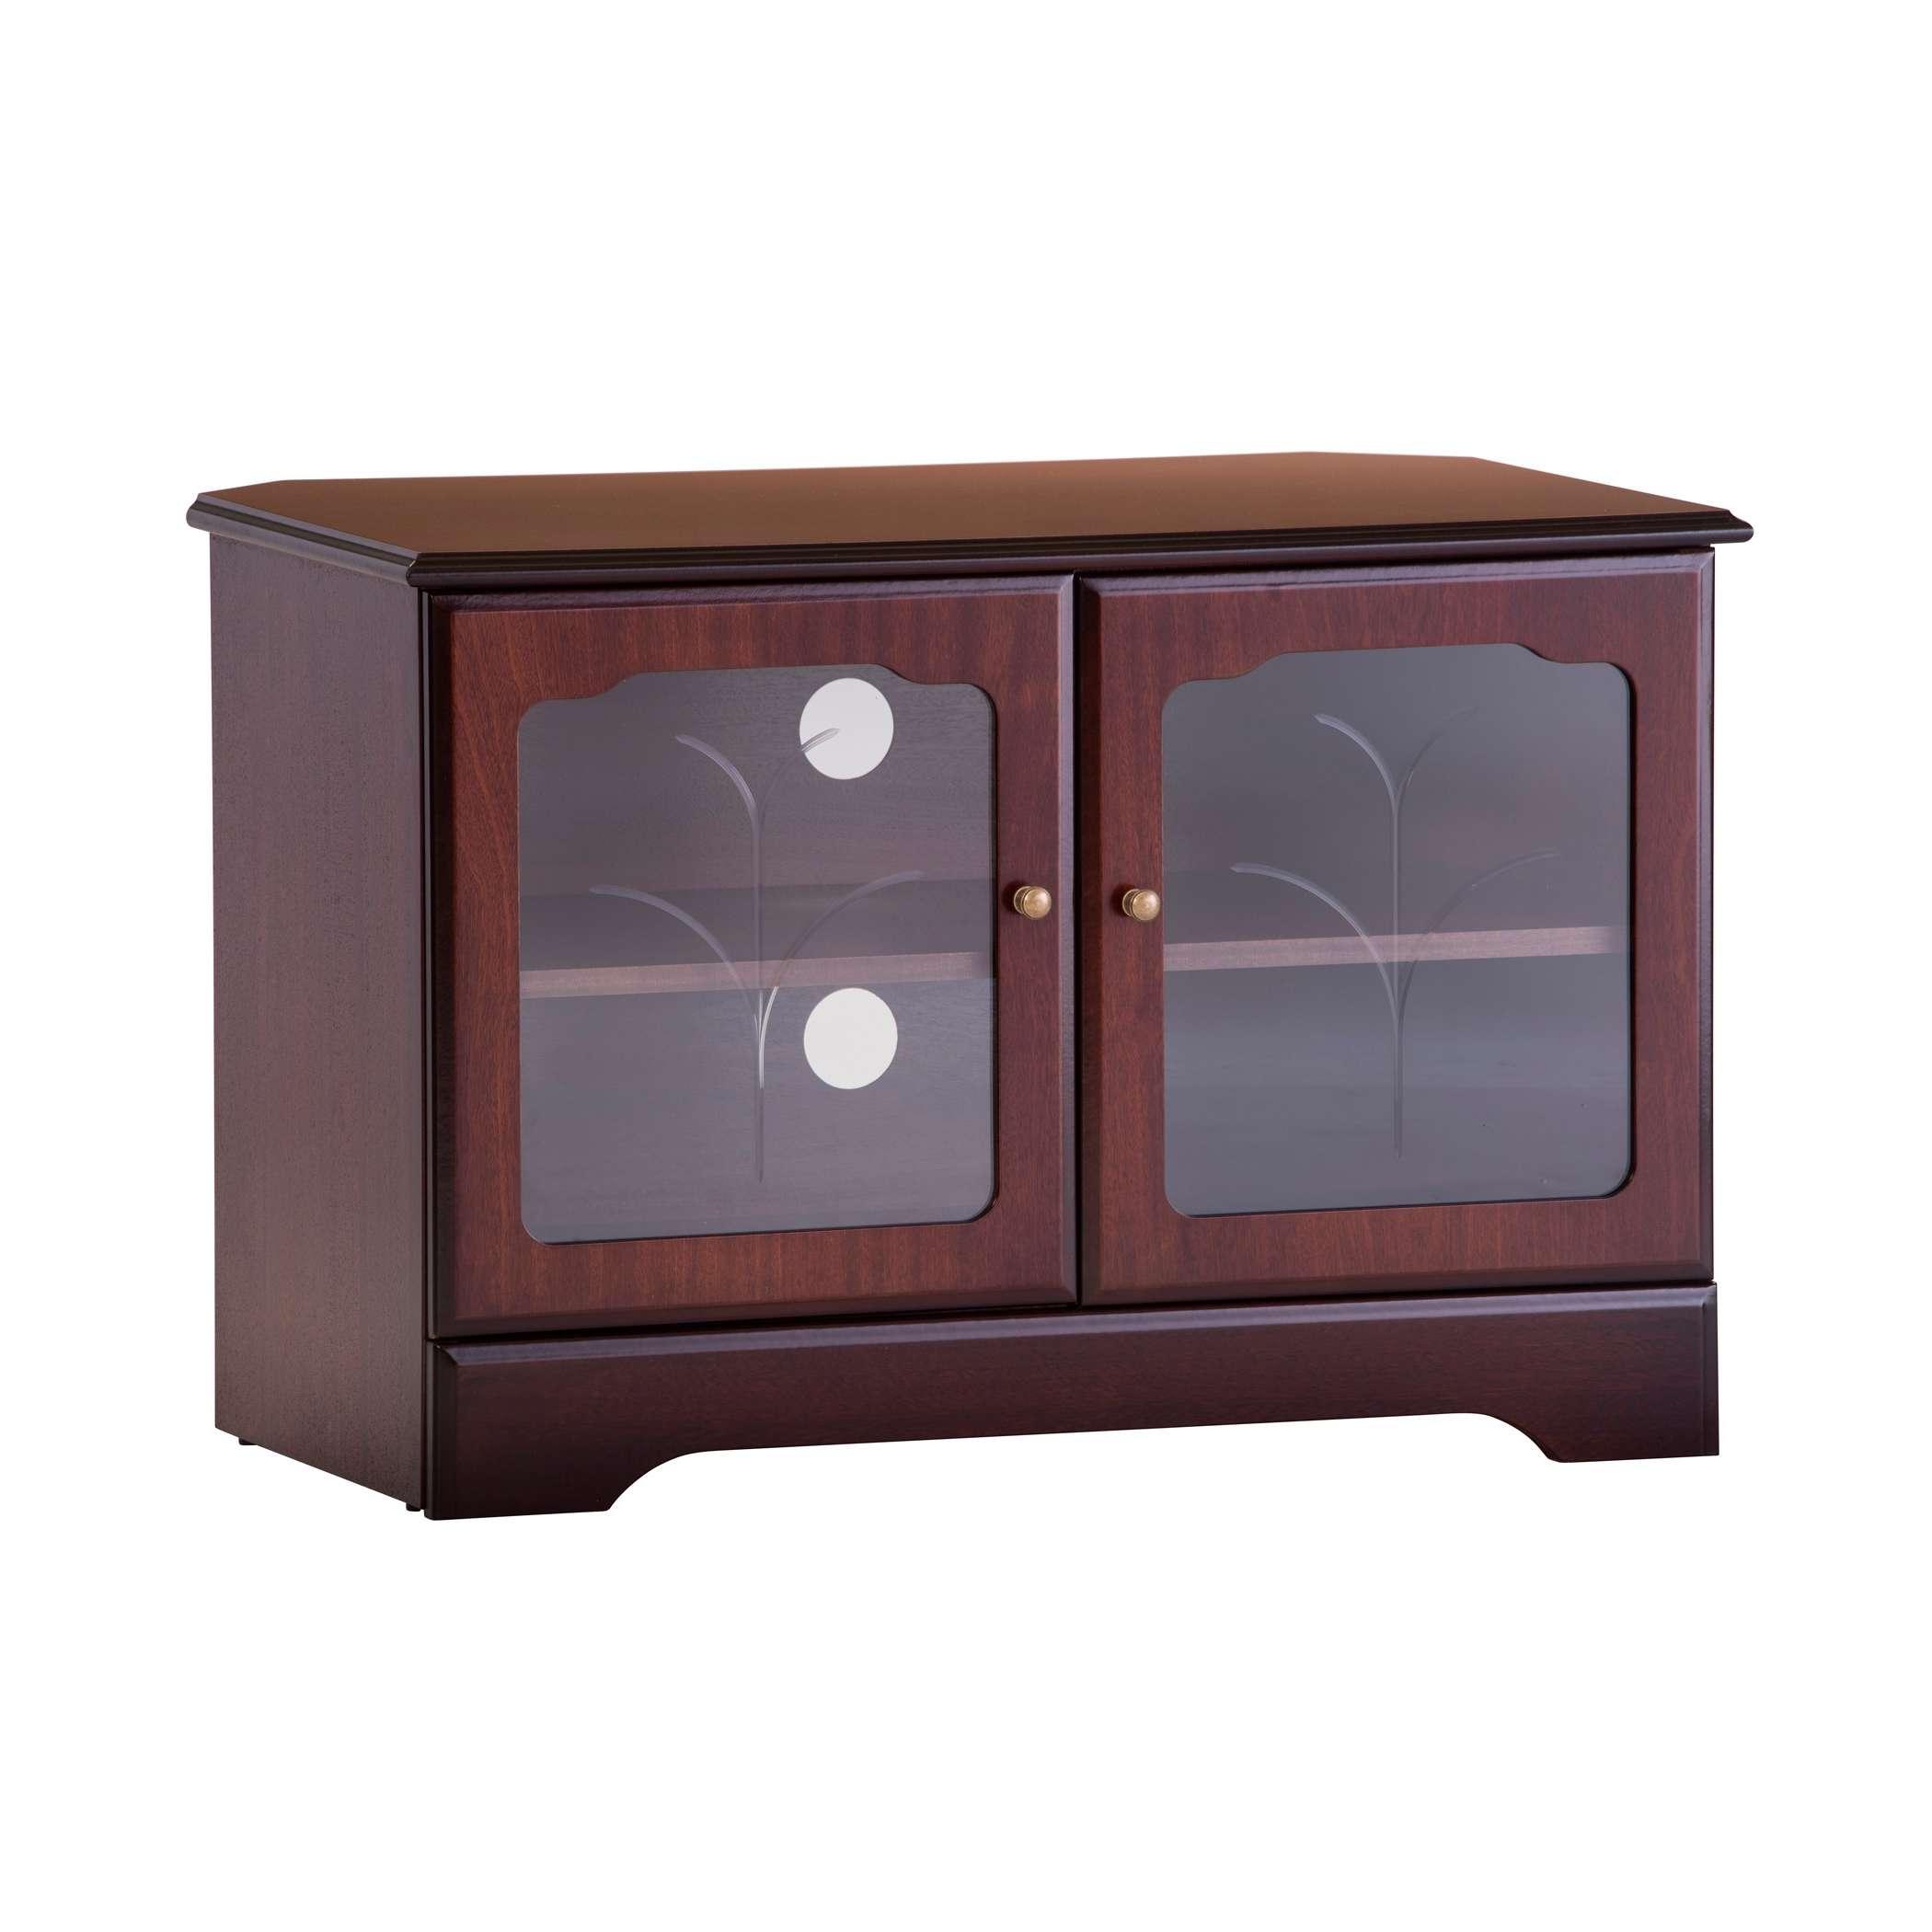 Corner Tv Stand In Mahogany Or Teak | Gola Furniture Uk Regarding Mahogany Corner Tv Stands (View 4 of 15)